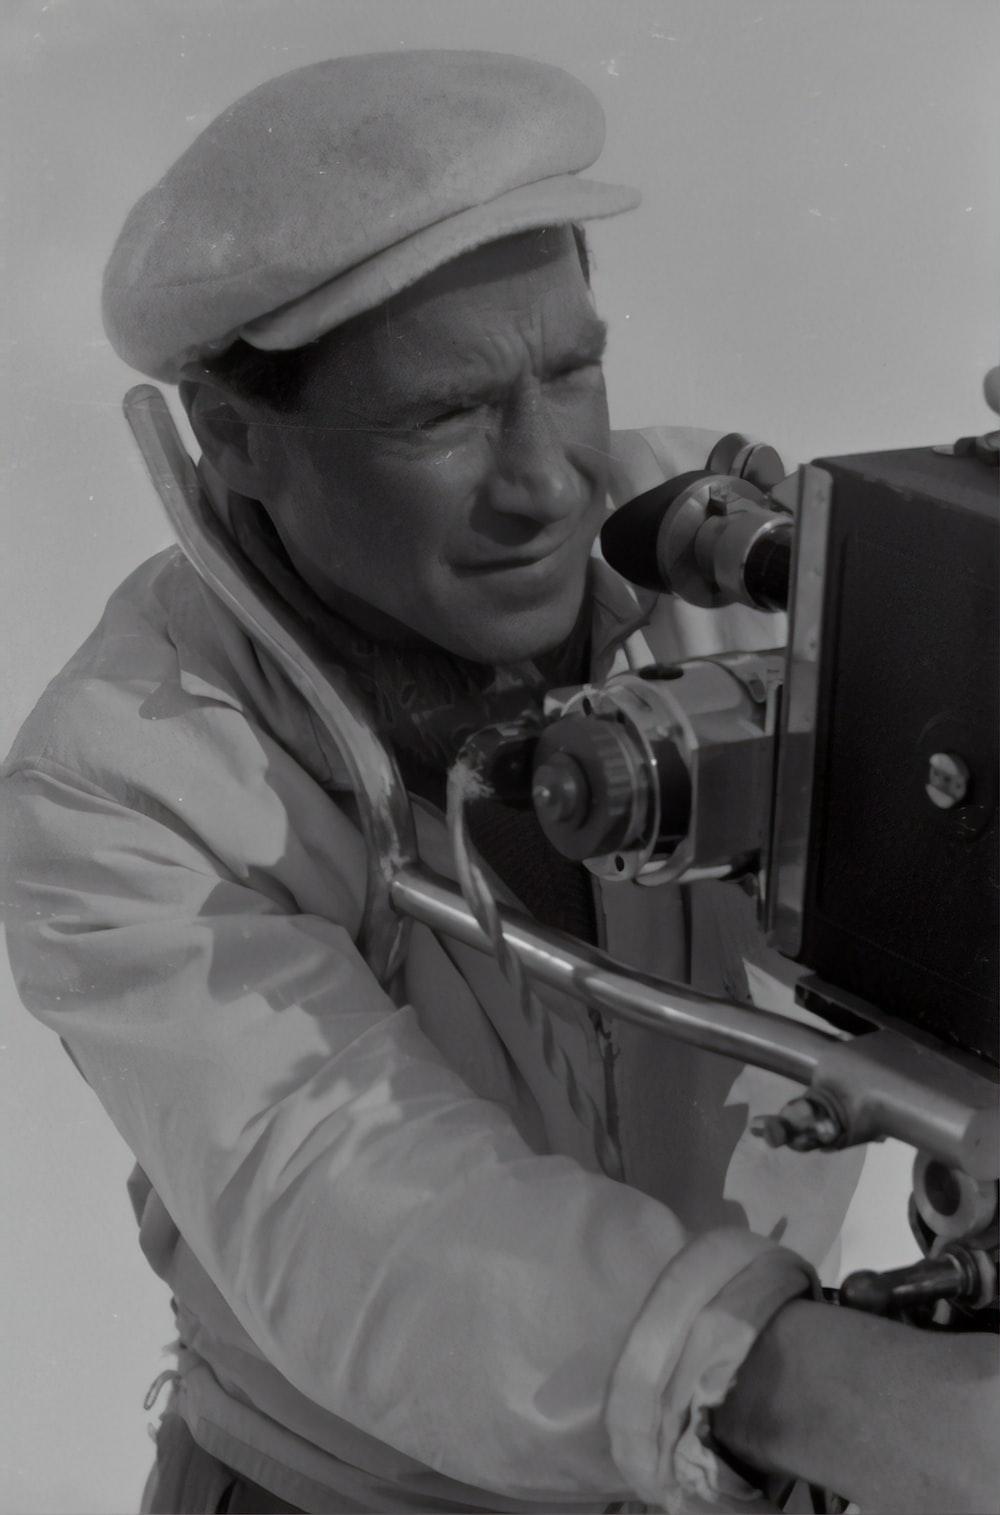 man in gray jacket using black dslr camera